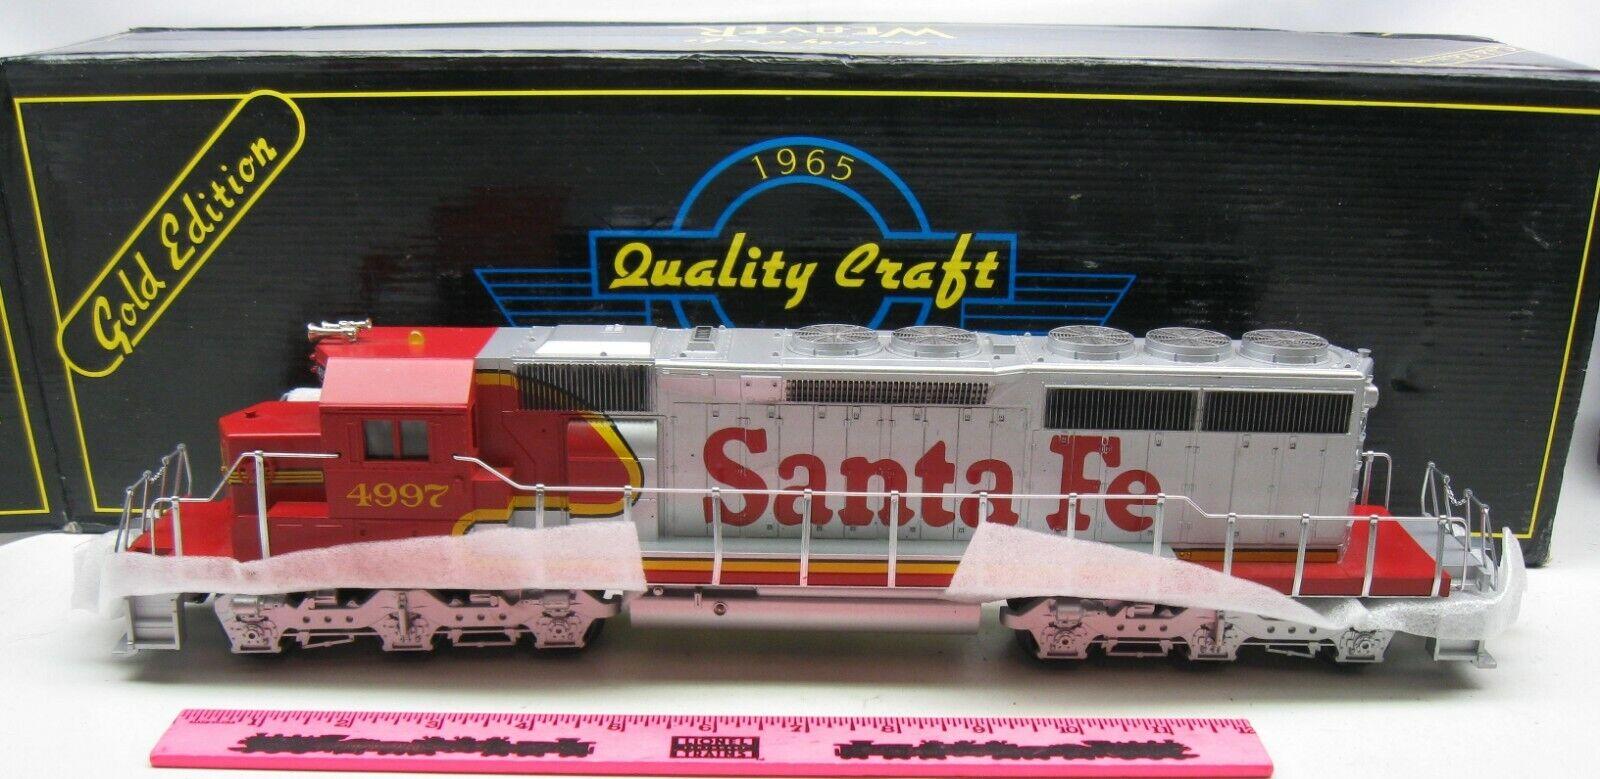 Weaver Santa Fe Warbonnet No. 4997 3-rail EMD SD40-2 Diesel